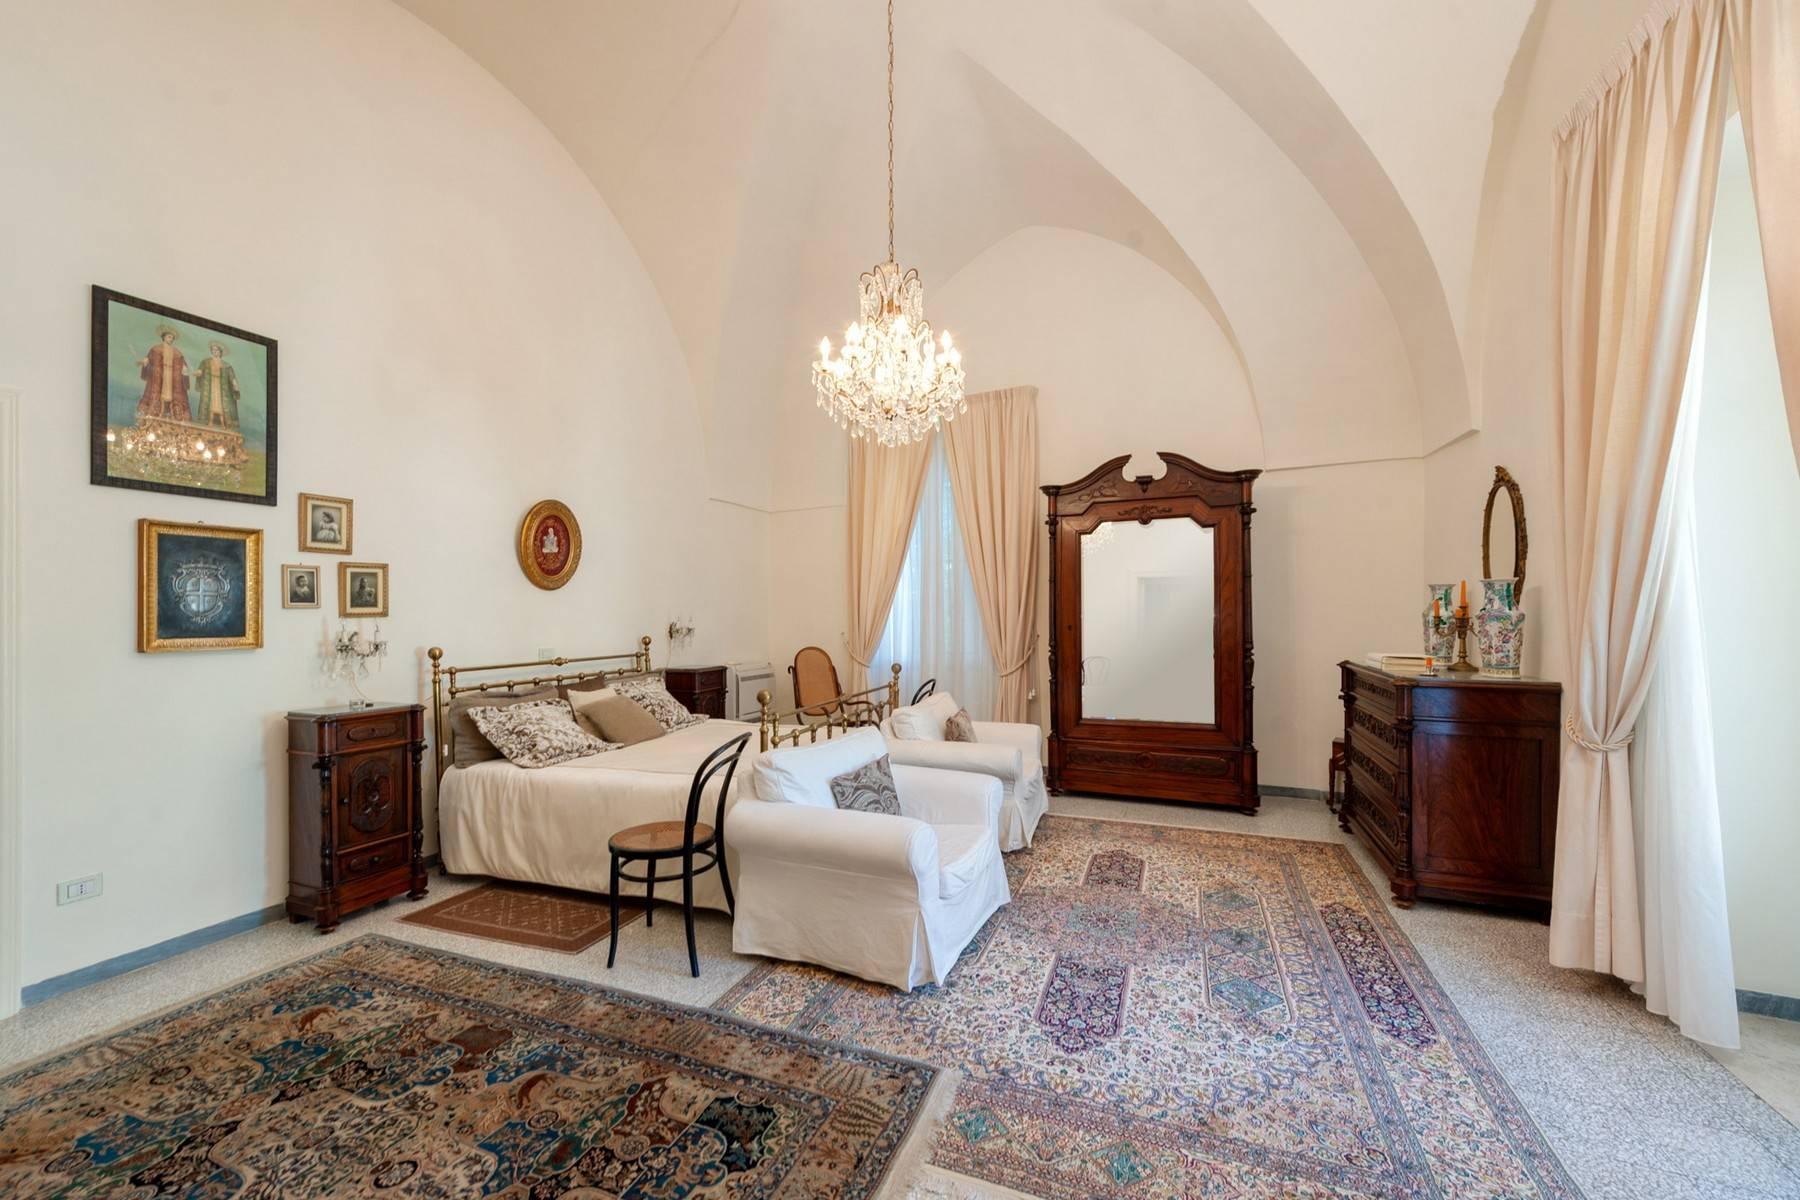 Splendida villa gentilizia del '600 circondata da agrumeti - 28